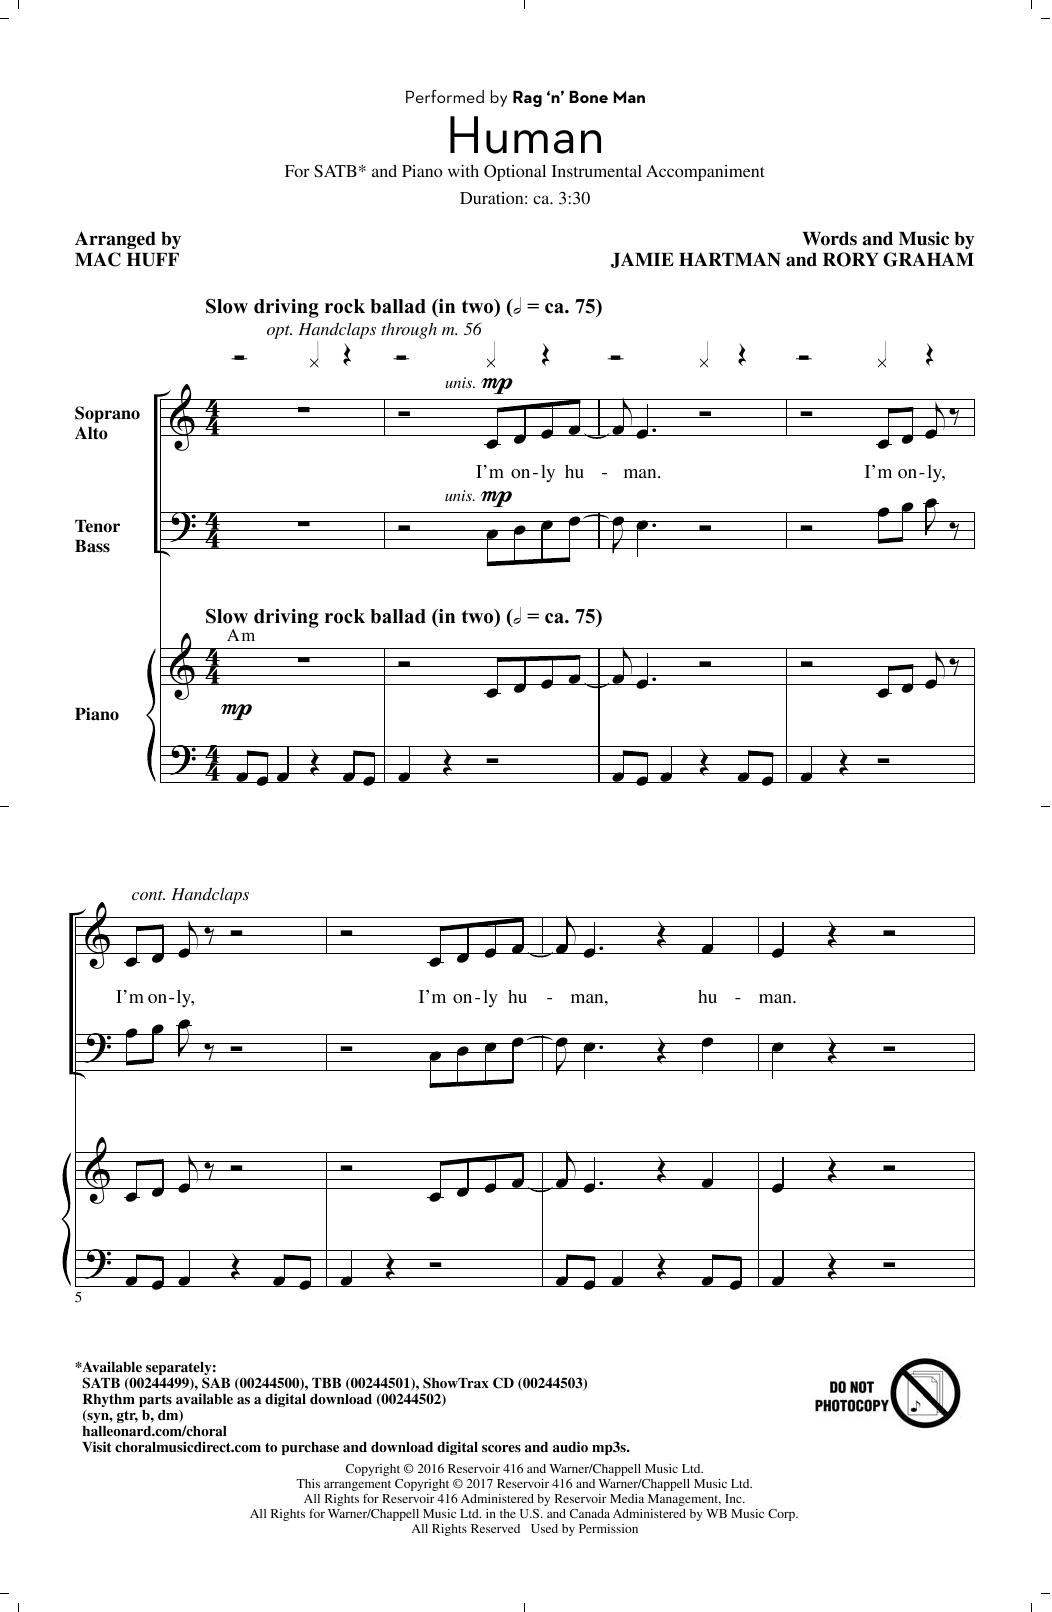 Human Sheet Music